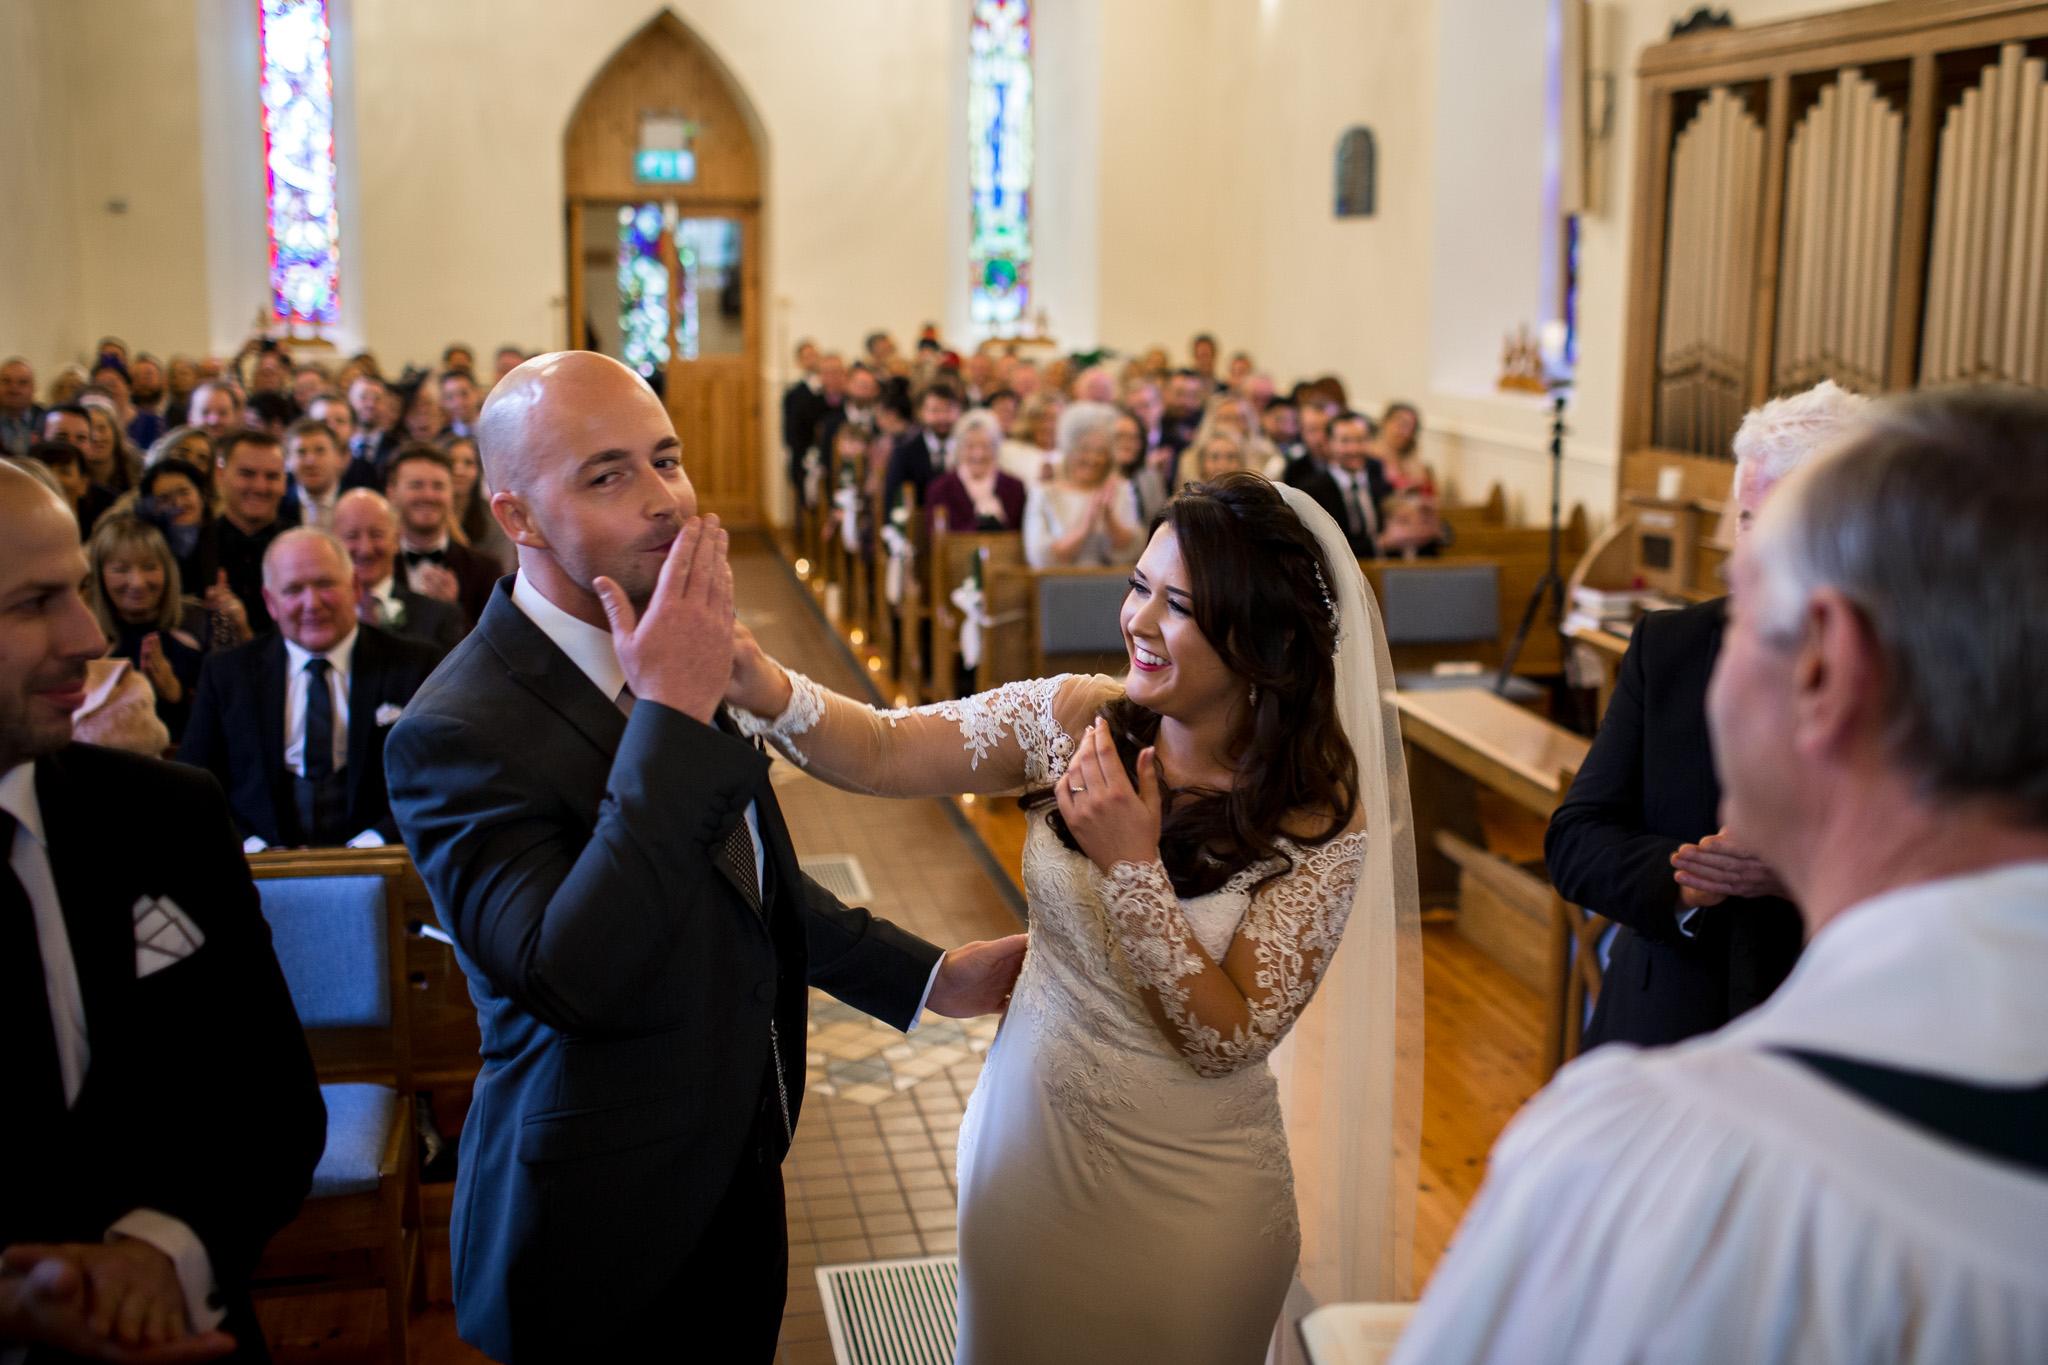 Mark_Barnes_Northern_Ireland_wedding_photographer_Harveys_Point_Donegall_Wedding_photography-Adam&Gemma-25.jpg